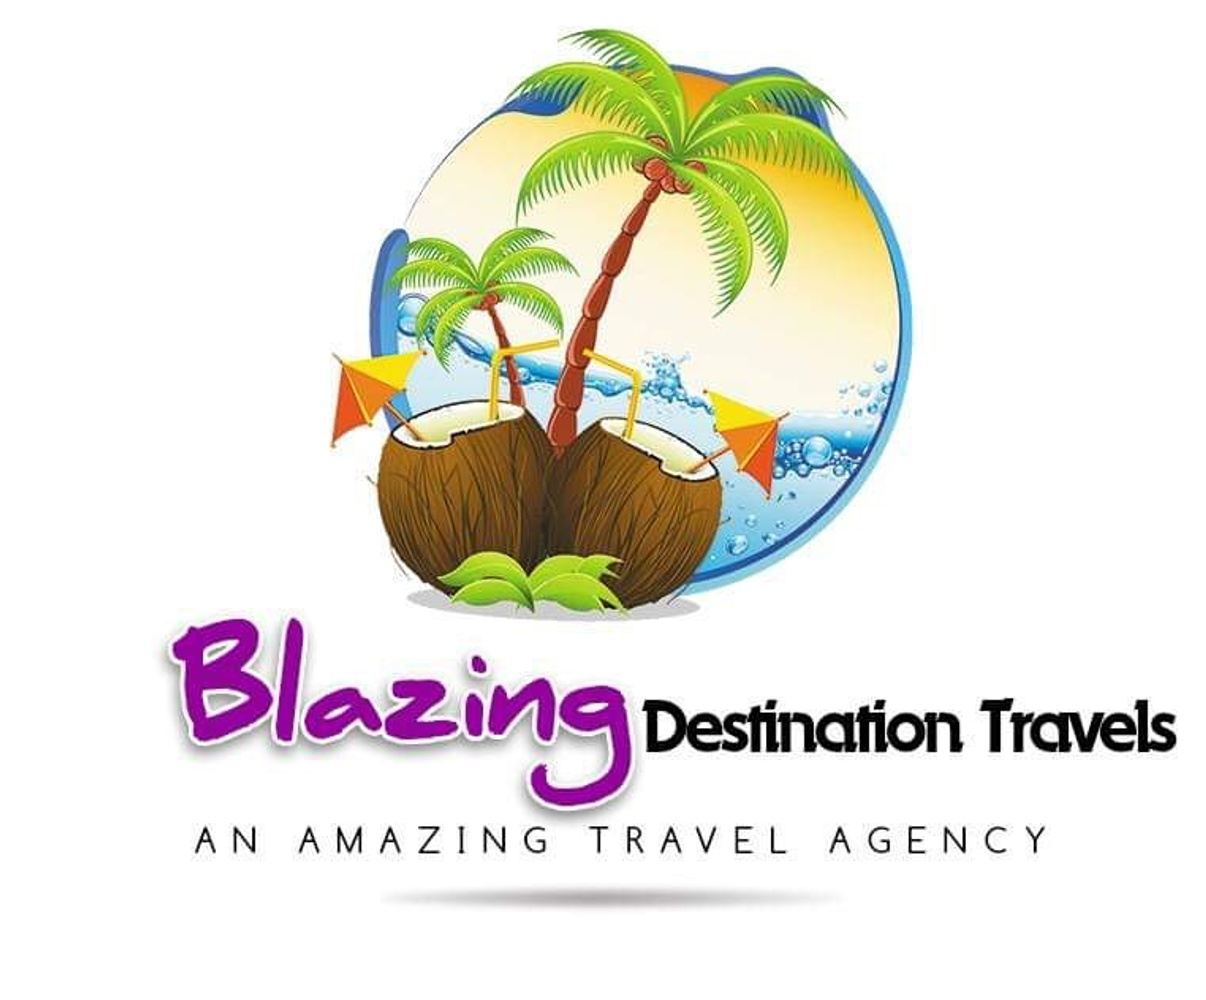 Epic japan trip via blazing destination travel